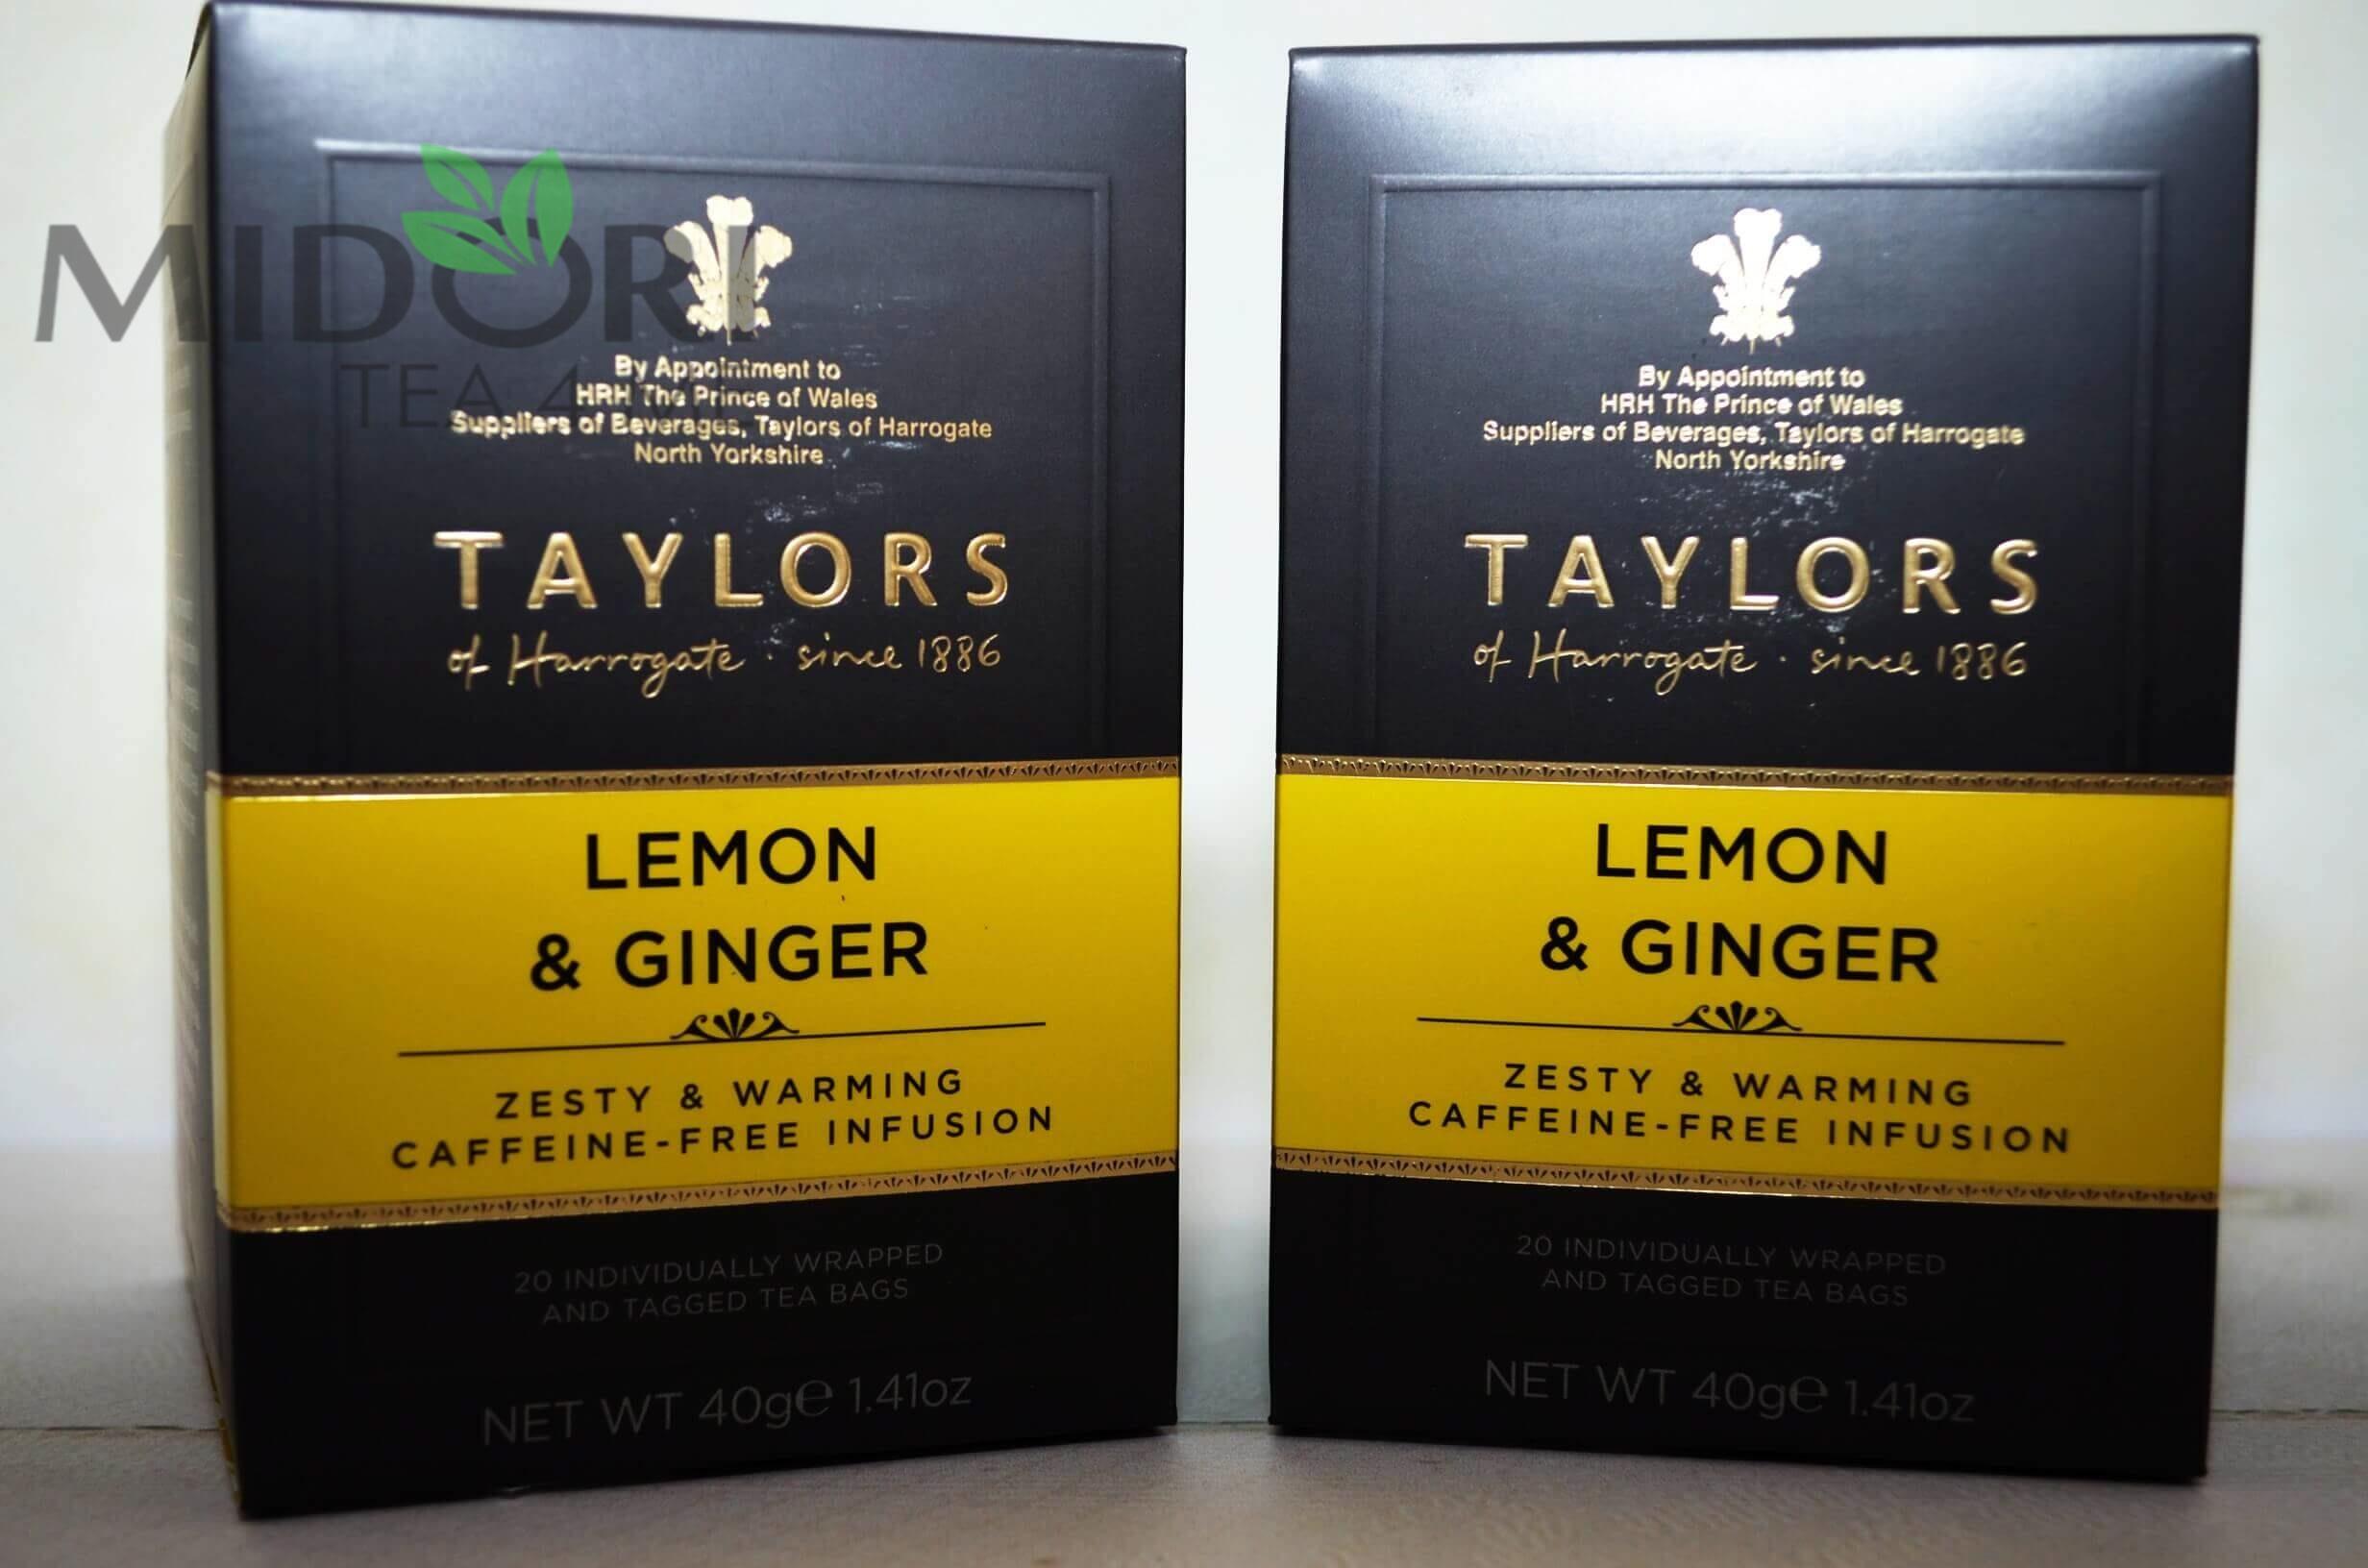 herbata taylors, taylors, tayors of harrogate, cytrynowo-imbirowa